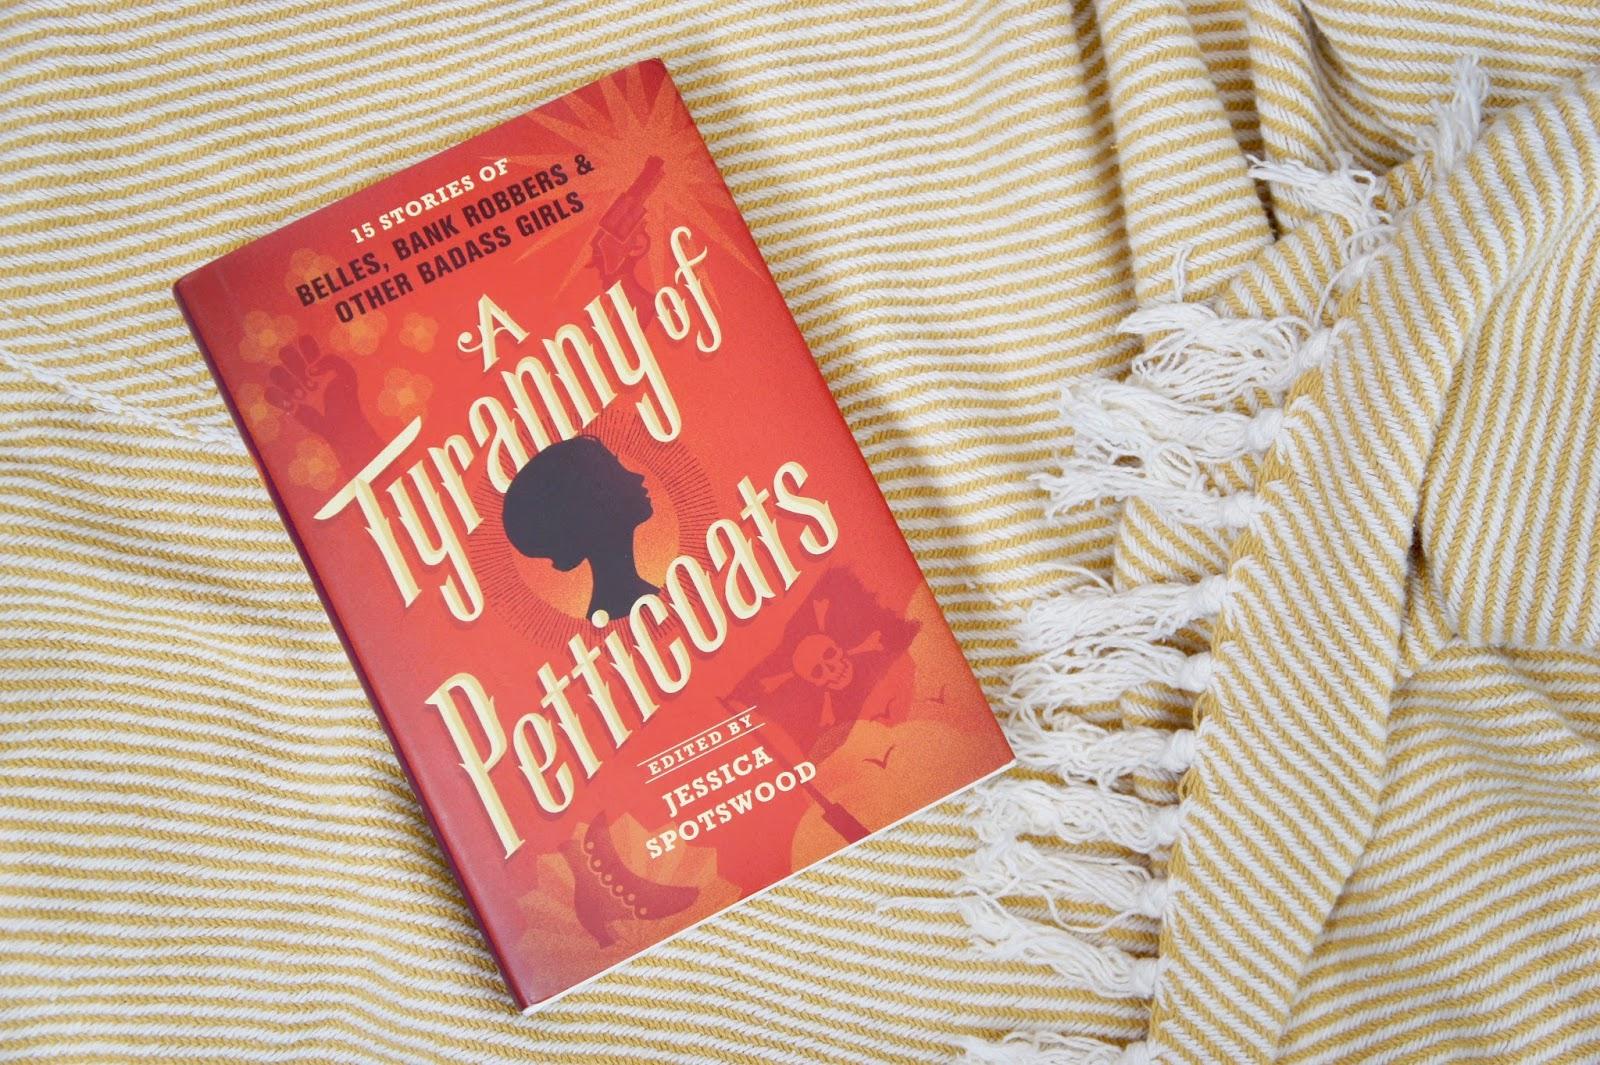 a tyranny of petticoats book club